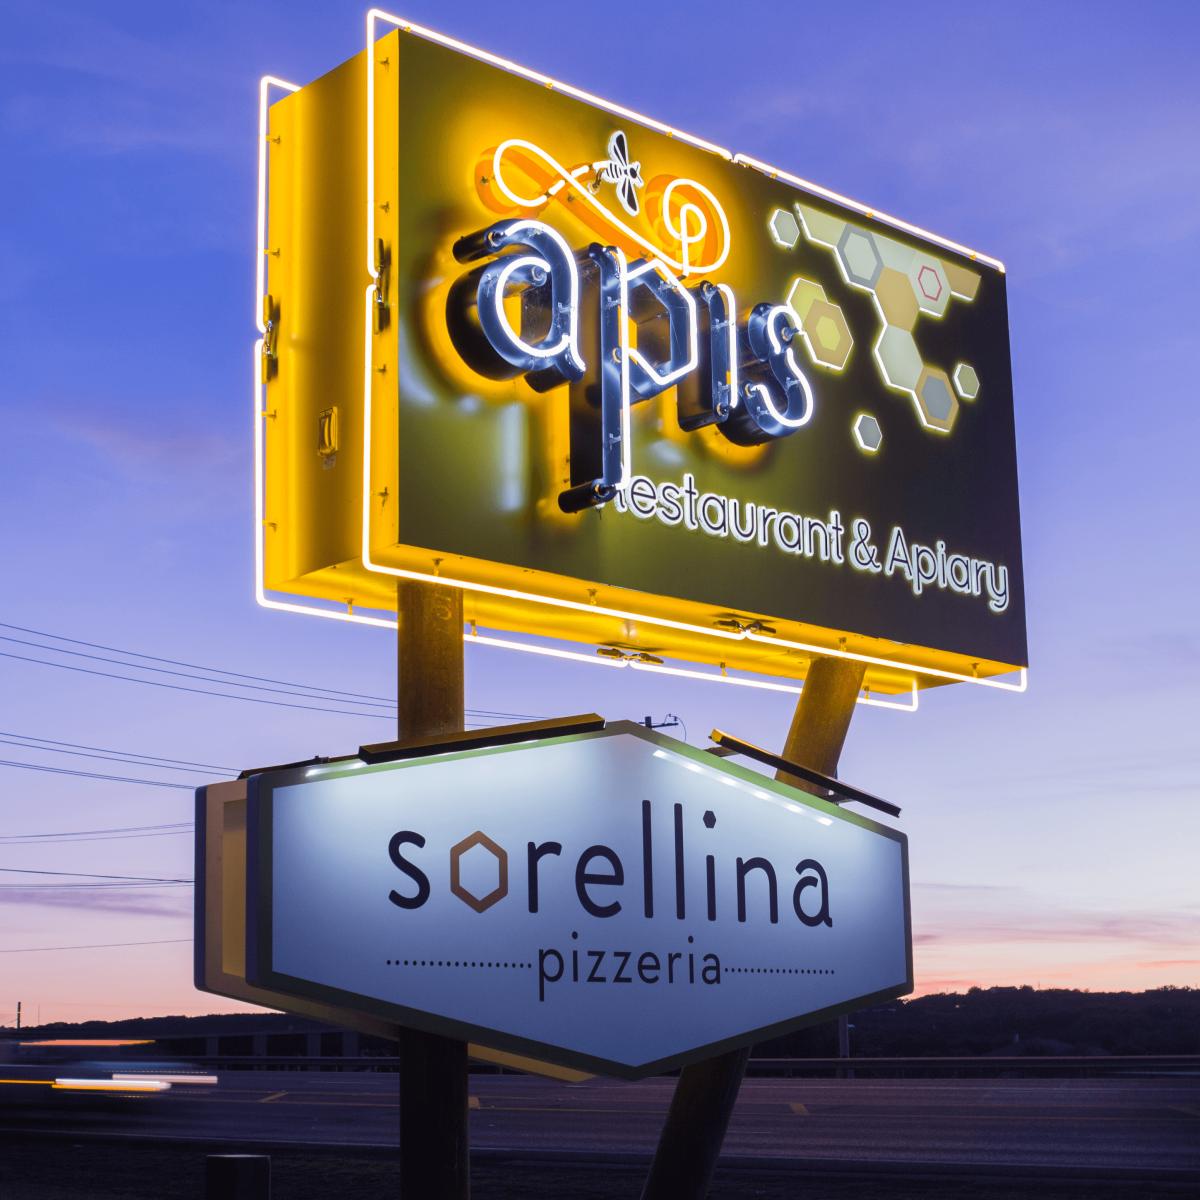 Apis Restaurant and Apiary Pizzeria Sorellina sign